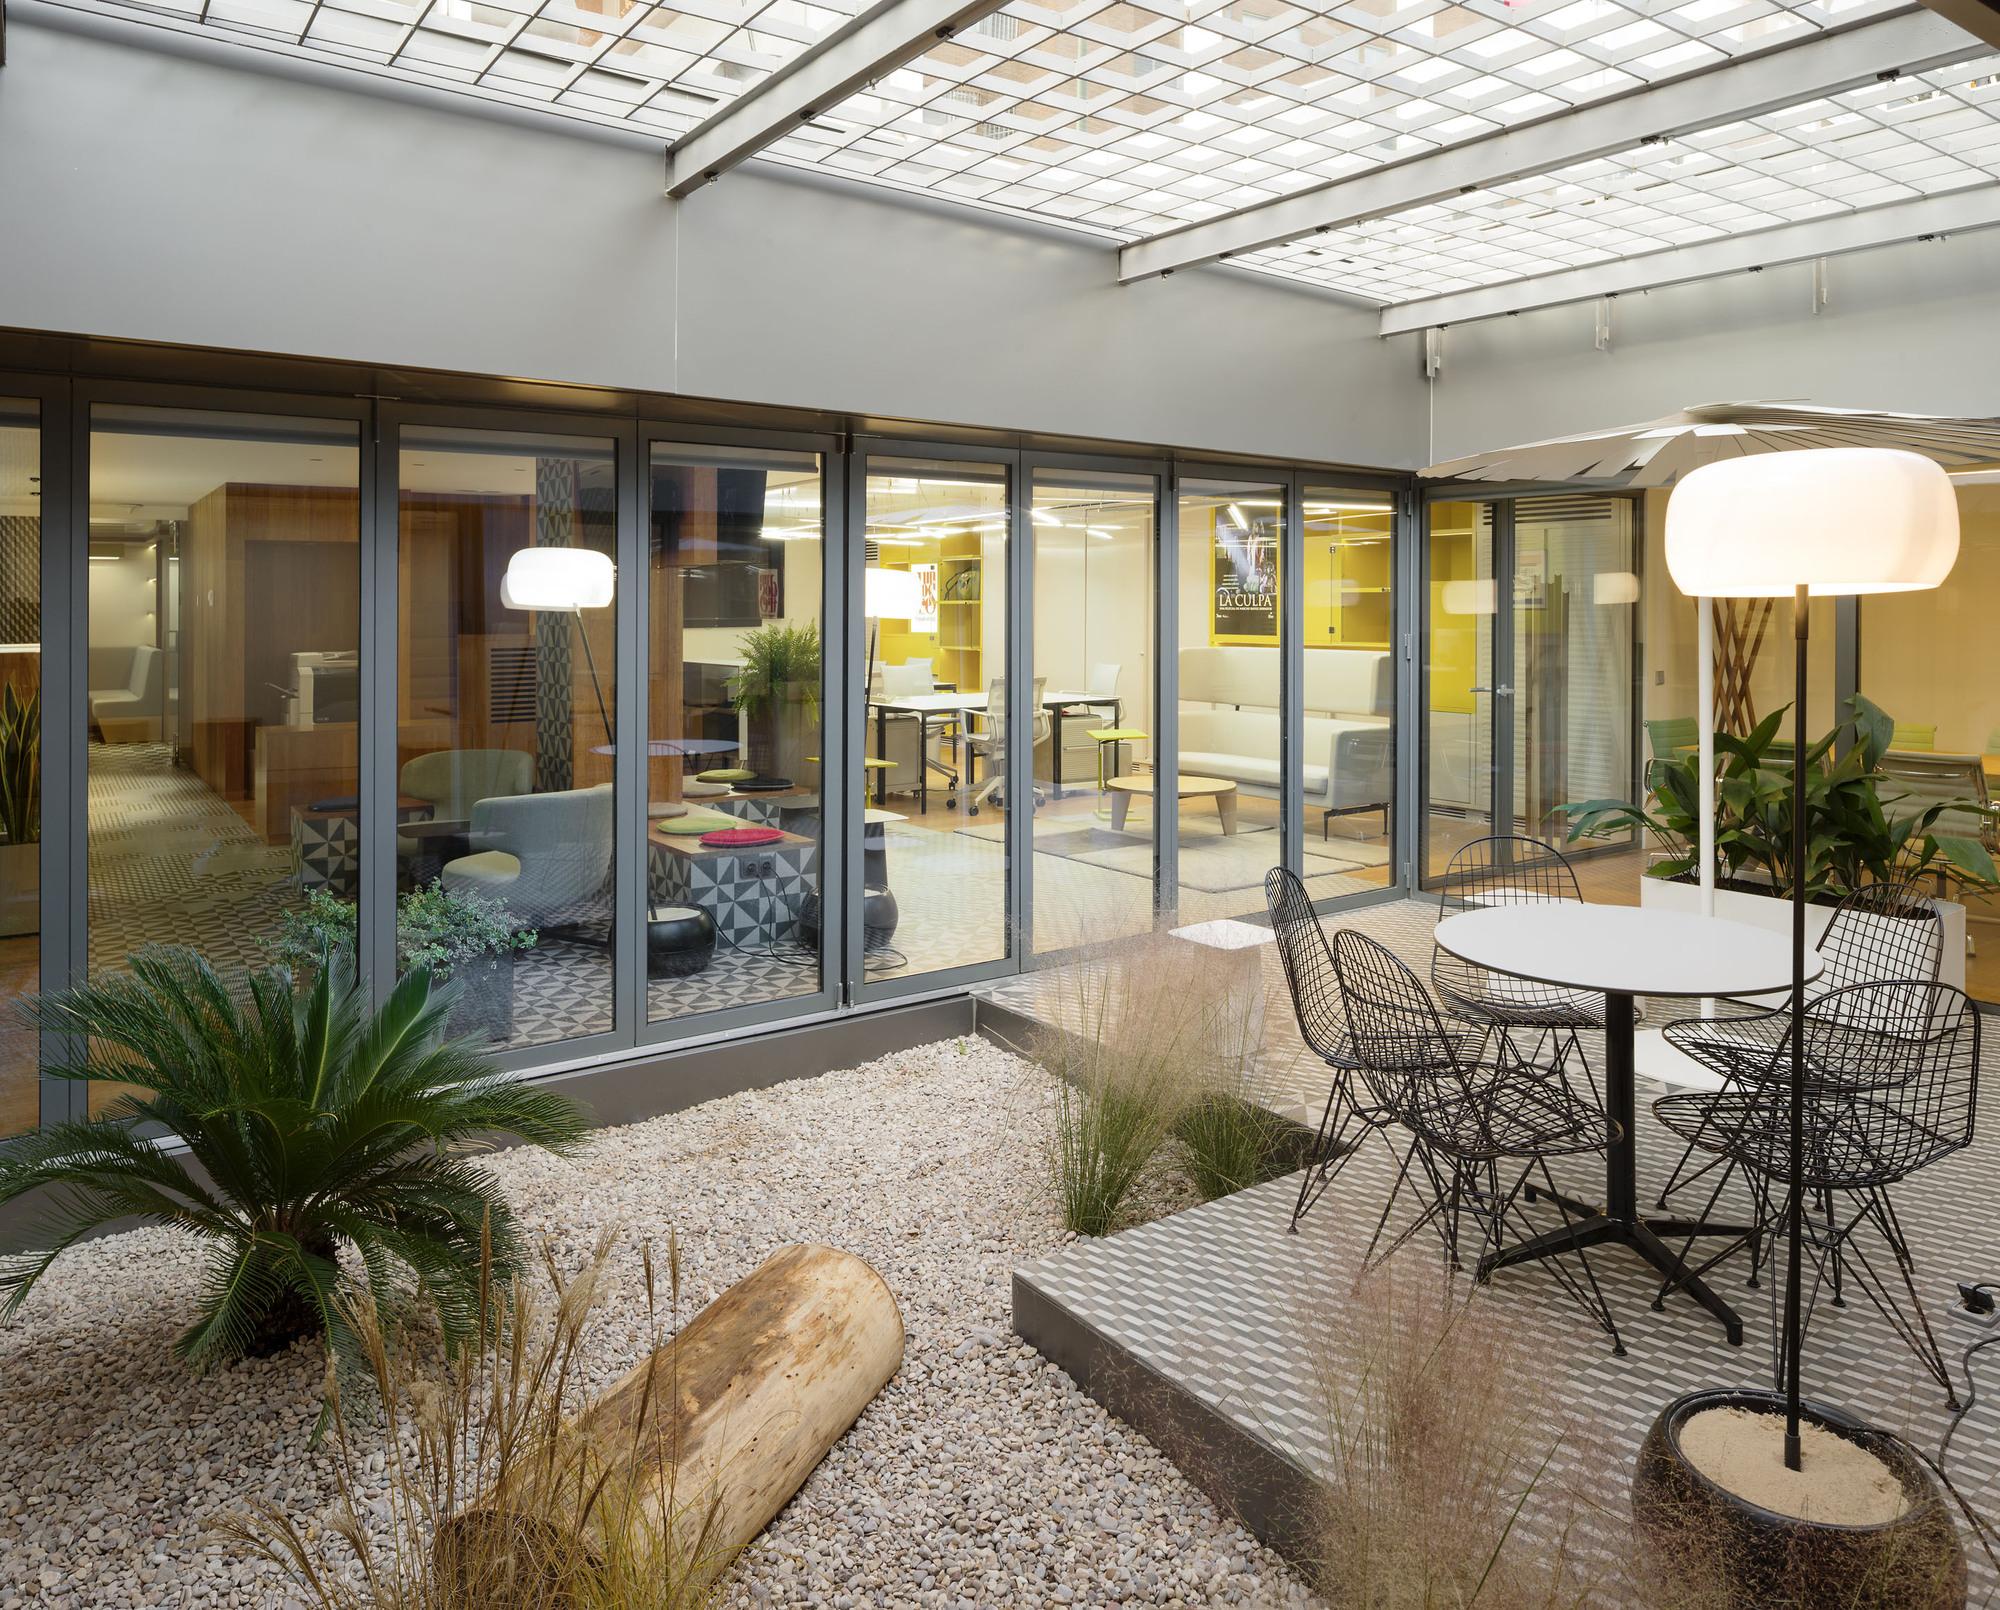 Oficinas Prointel Agi Architects Plataforma Arquitectura